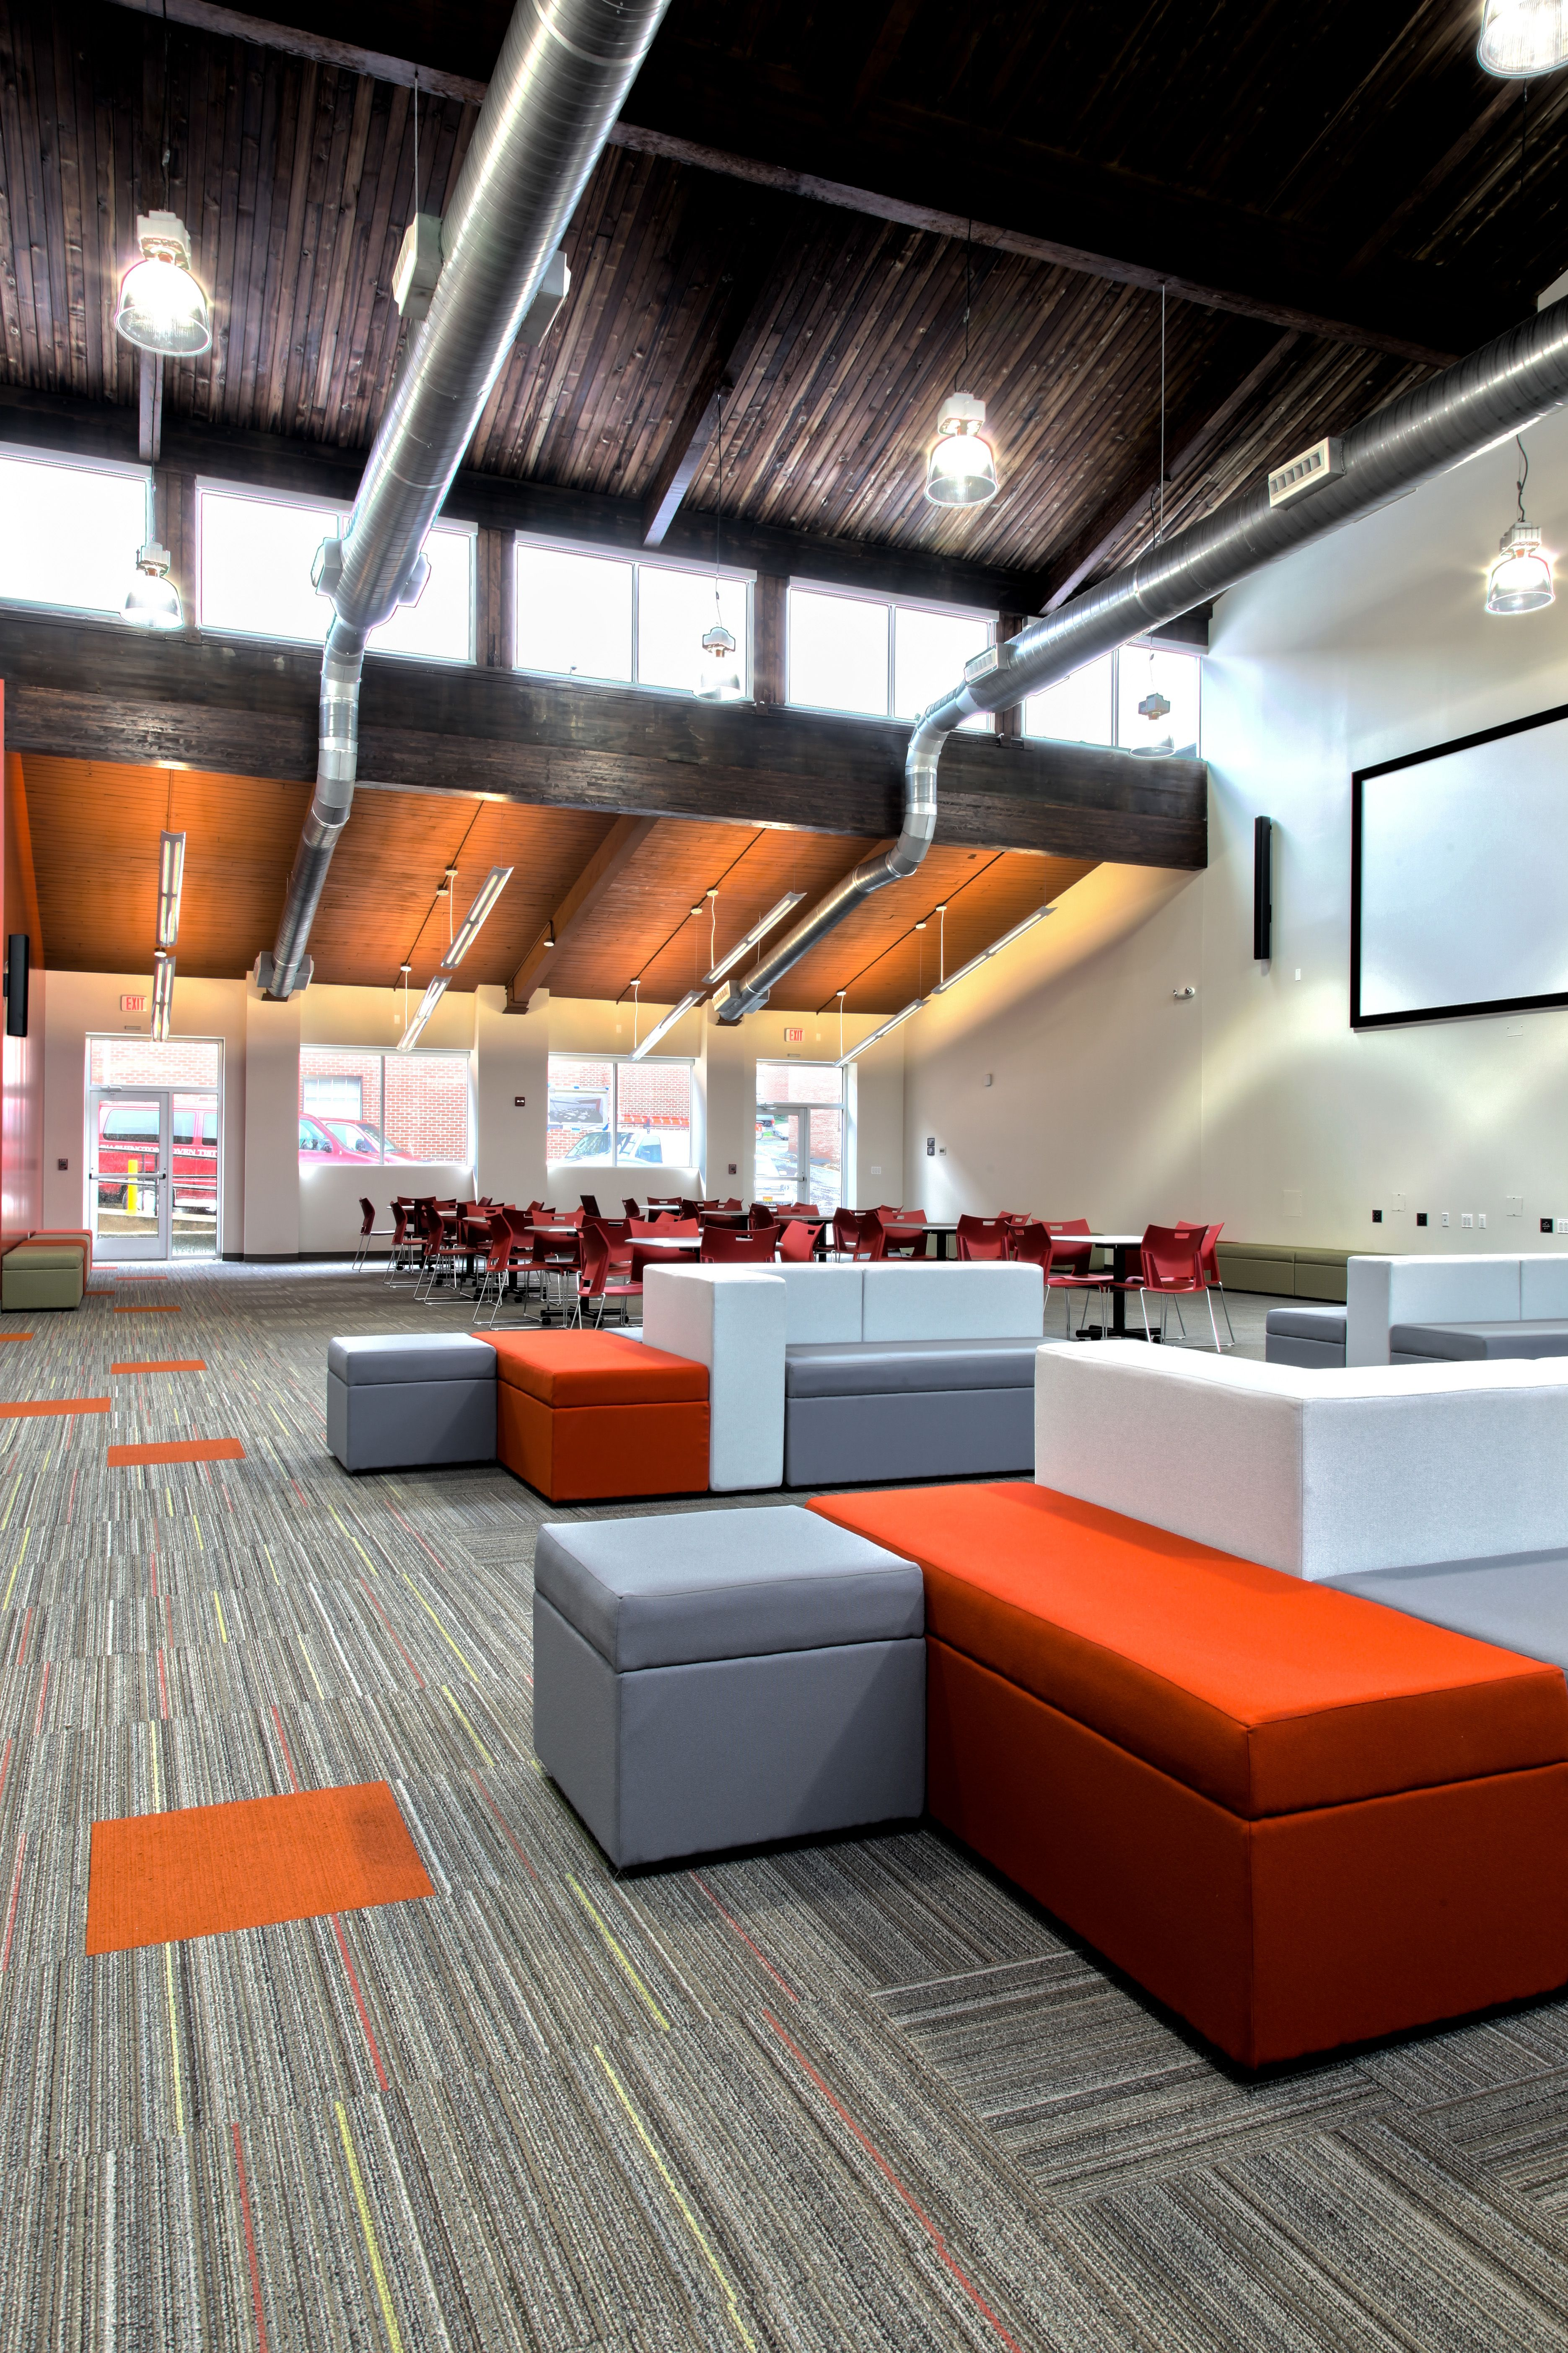 washington adventist university student center lounge interior student house college. Black Bedroom Furniture Sets. Home Design Ideas